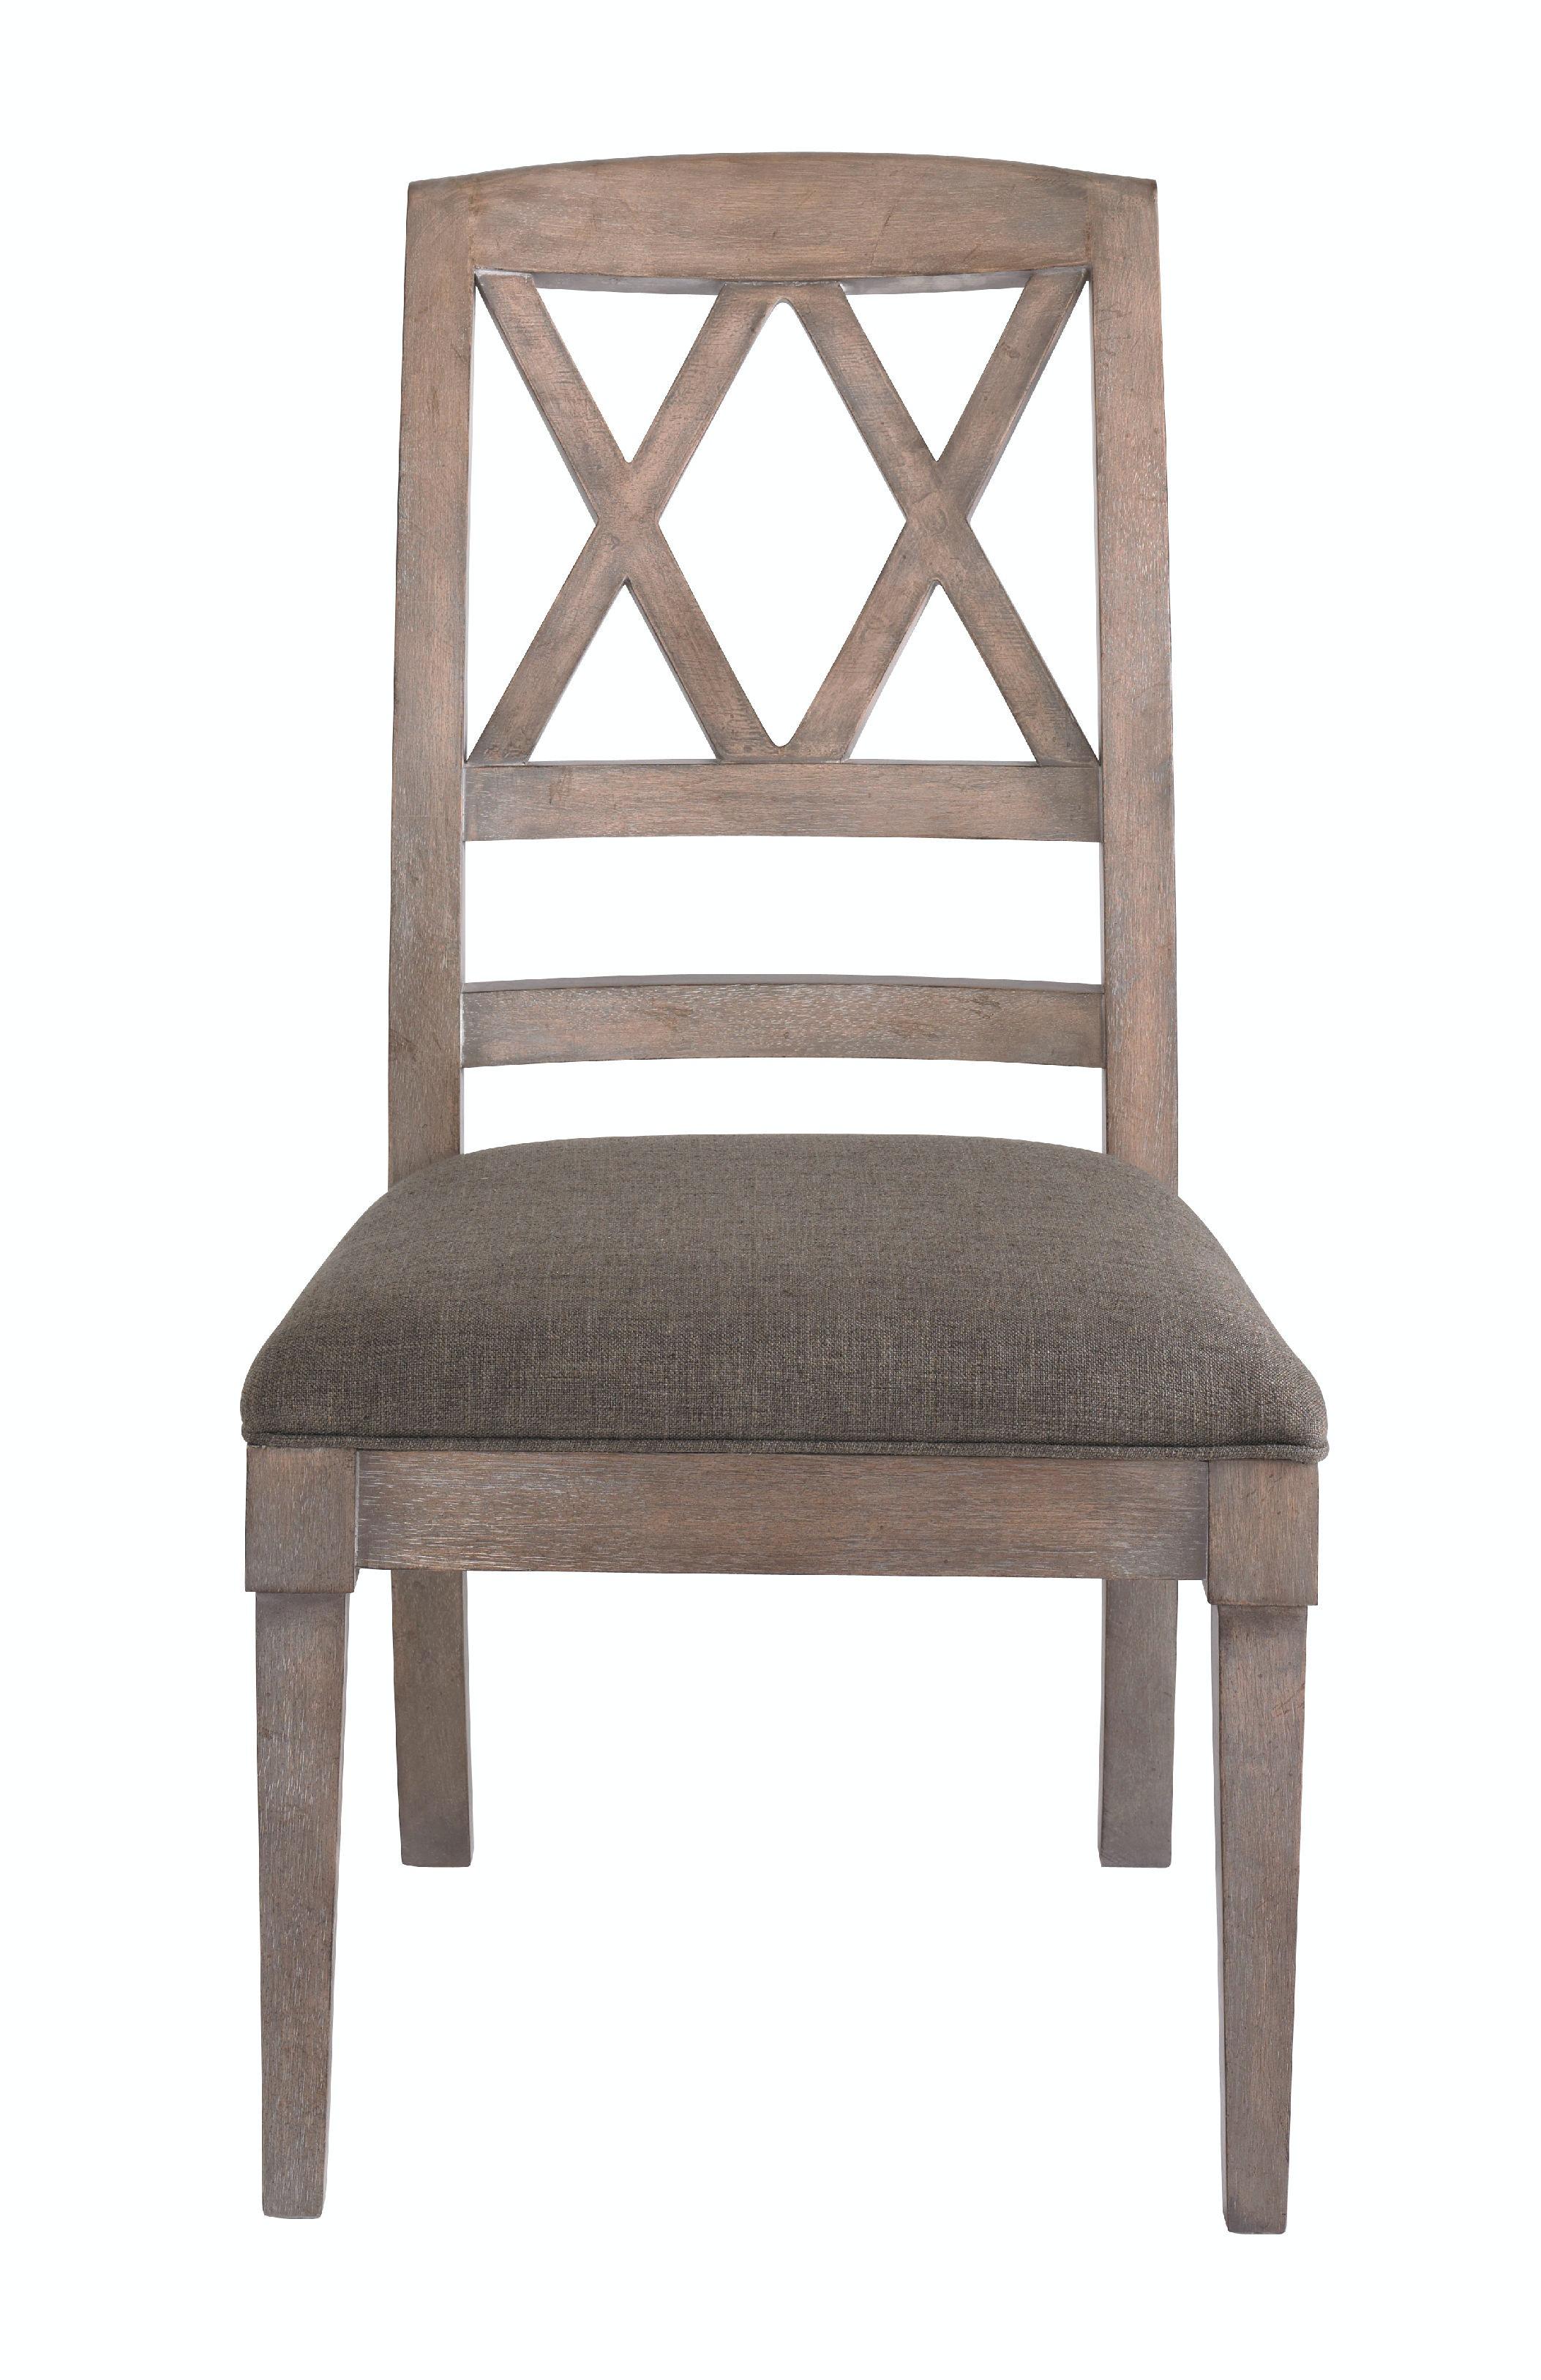 Bassett Dining Room X Back Side Chair 4525 2455 Hickory Furniture Mart Hi